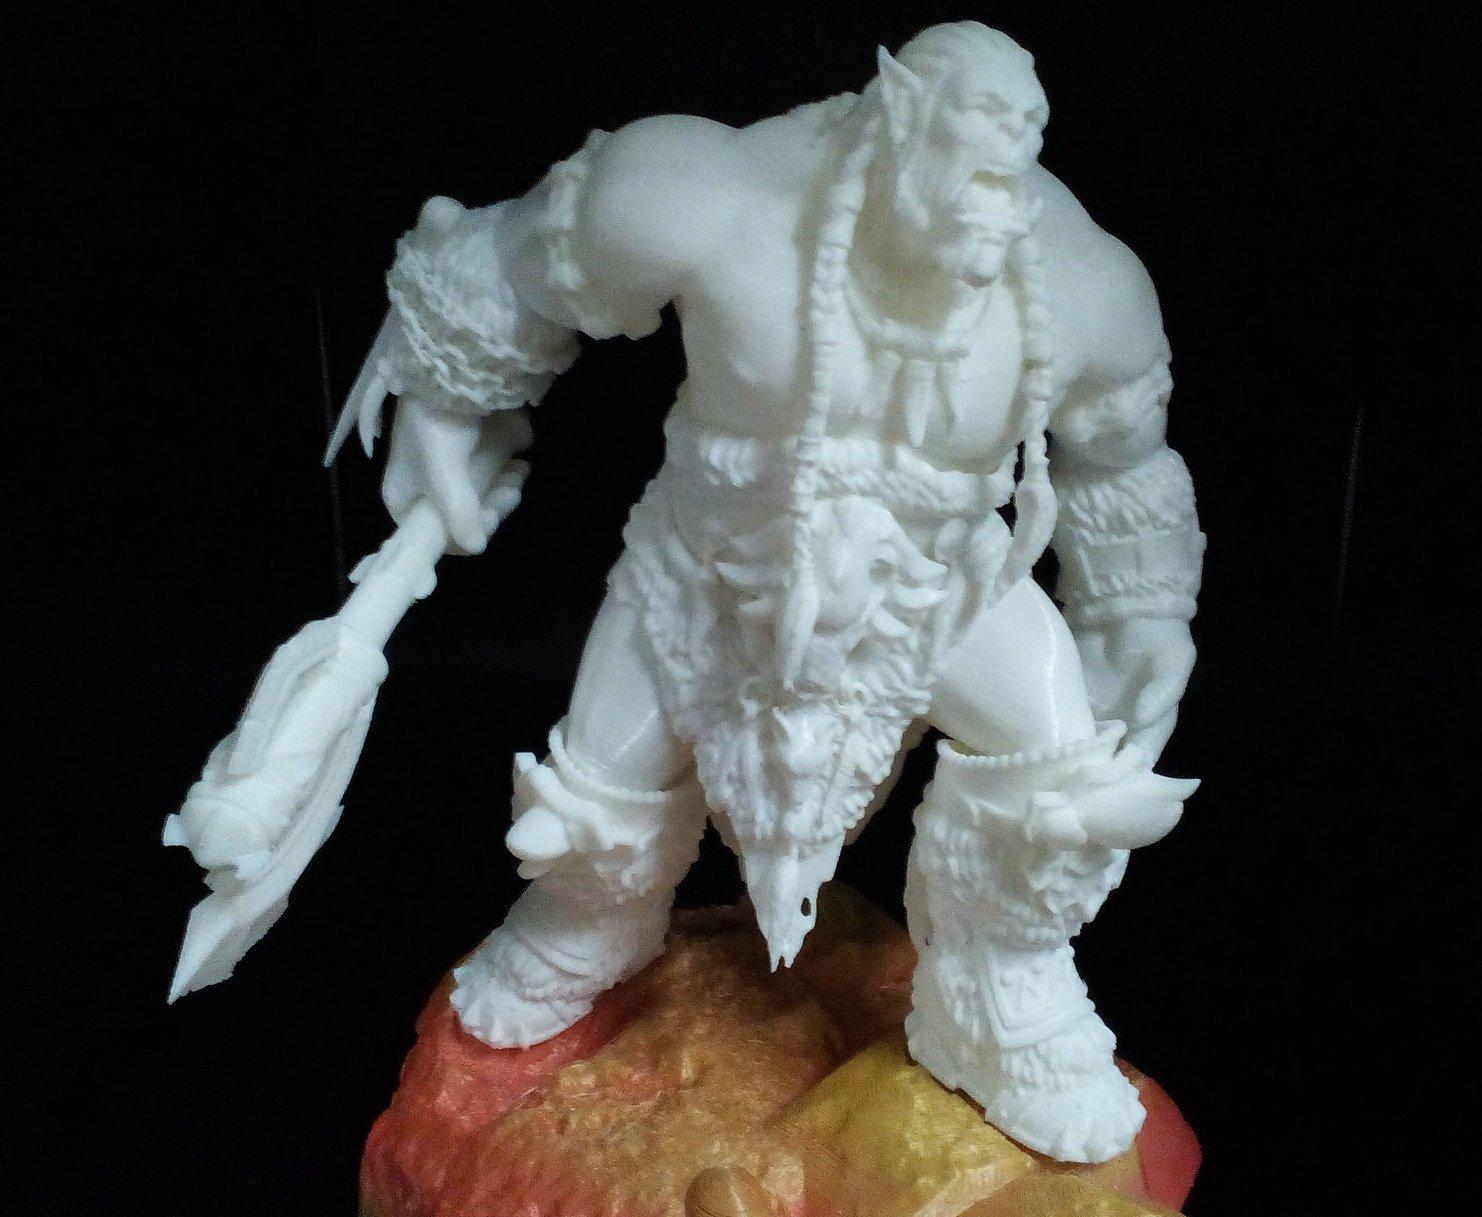 2.2 lbs // 1kg Spool 3DDPLUS 1.75mm PLA 3D Printer Filament White Dimensional Accuracy 0.05mm